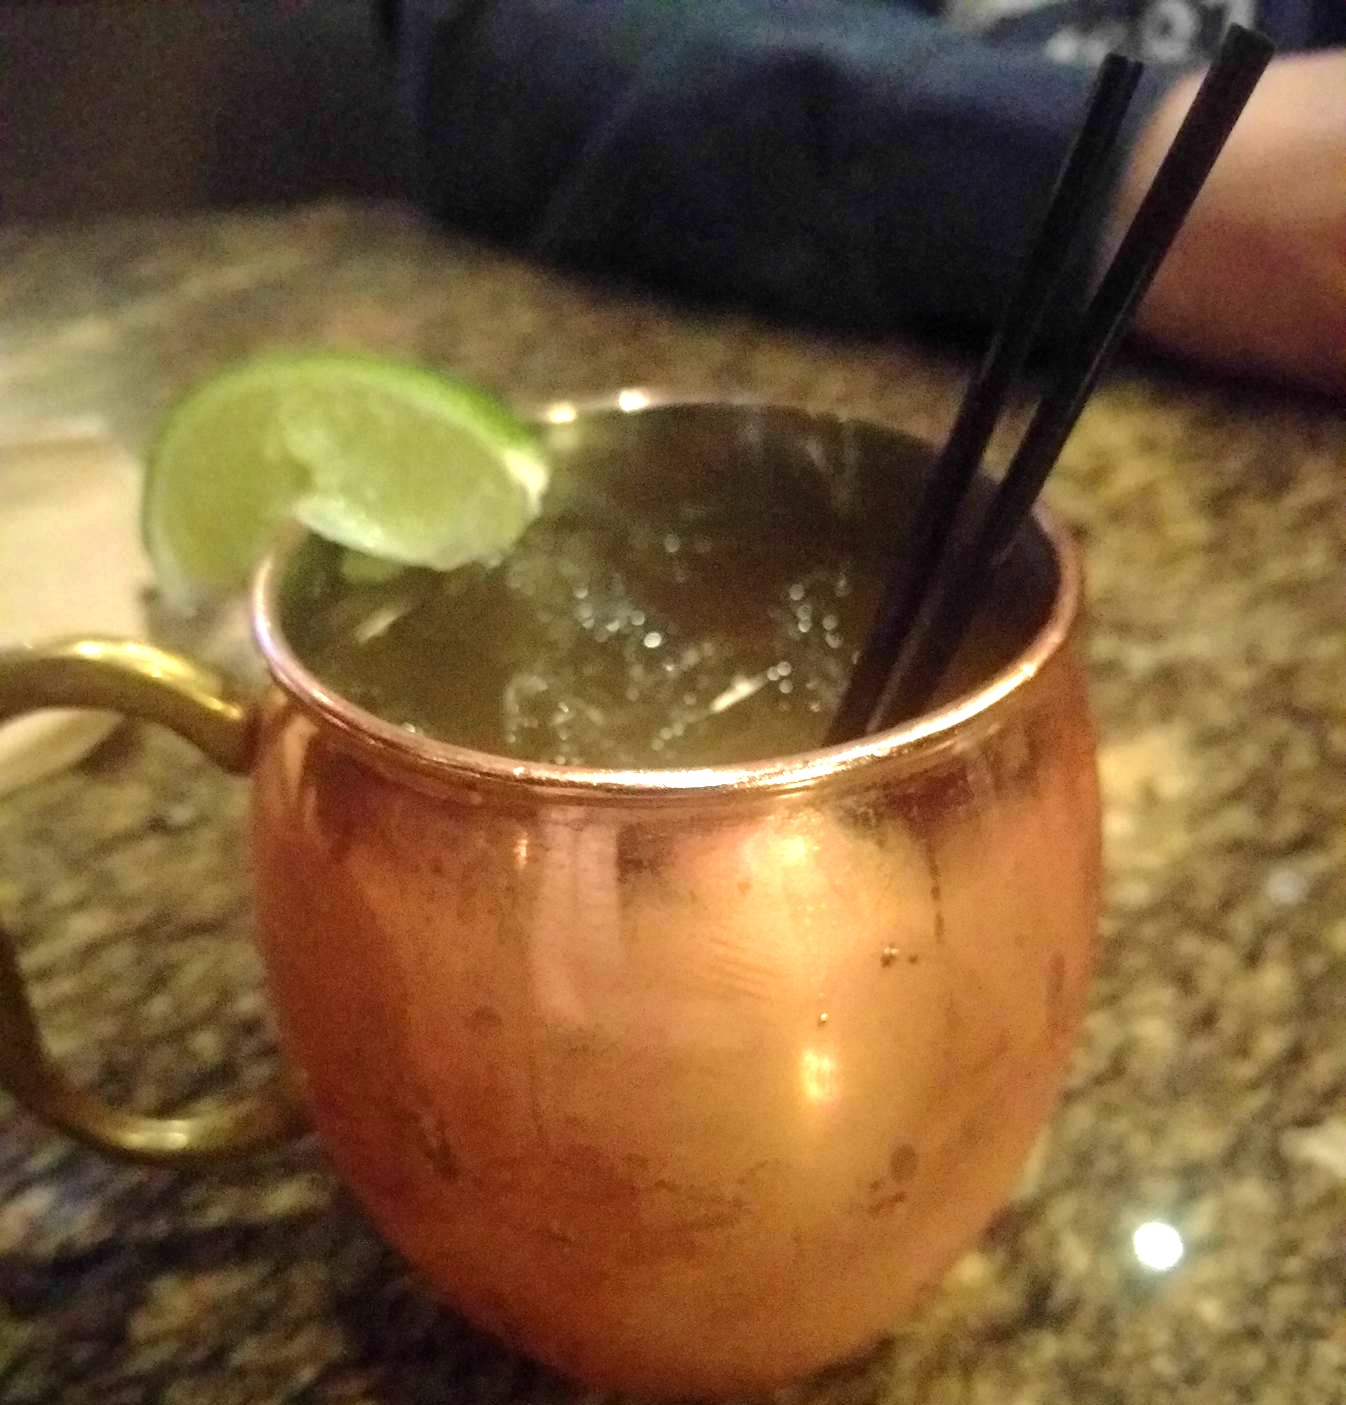 Irish Mule, BJs Brewhouse, Menifee, CA #irishfood #IrishMule #bjs #menifee #california